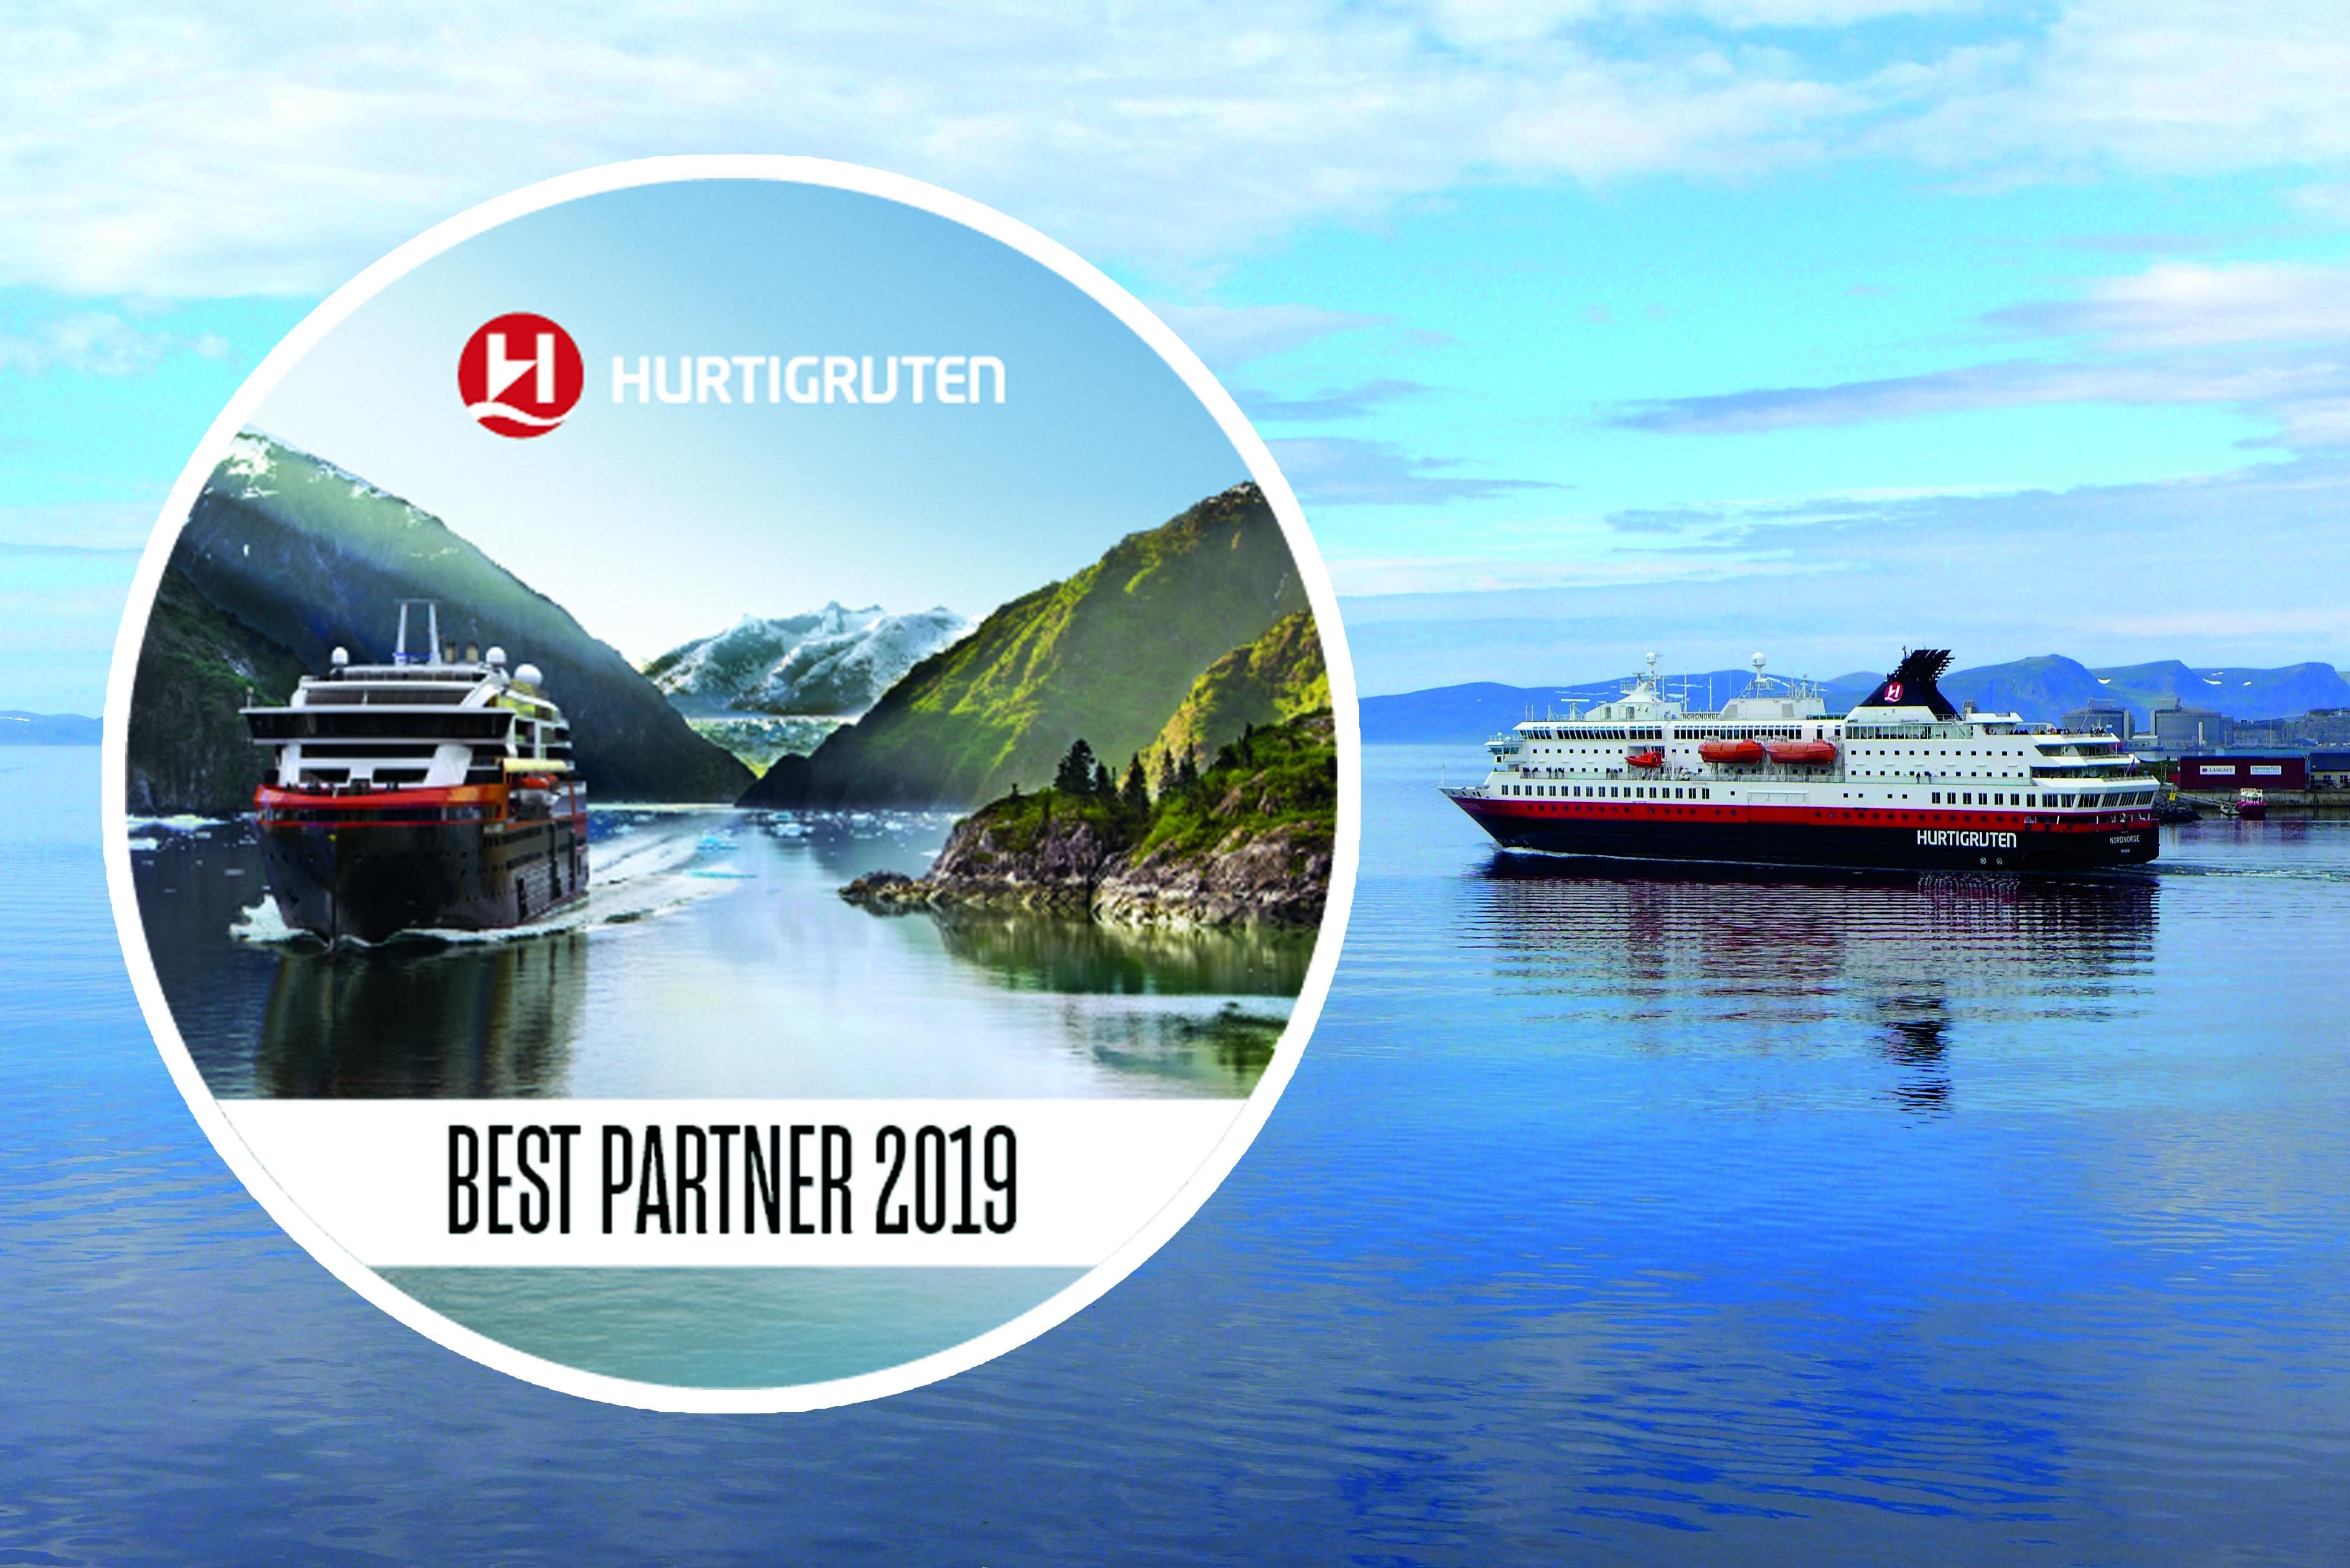 https://assets.eberhardt-travel.de/2019/Newsletter/67611_Hurtigruten_Best_Partner_2019_Original.jpg